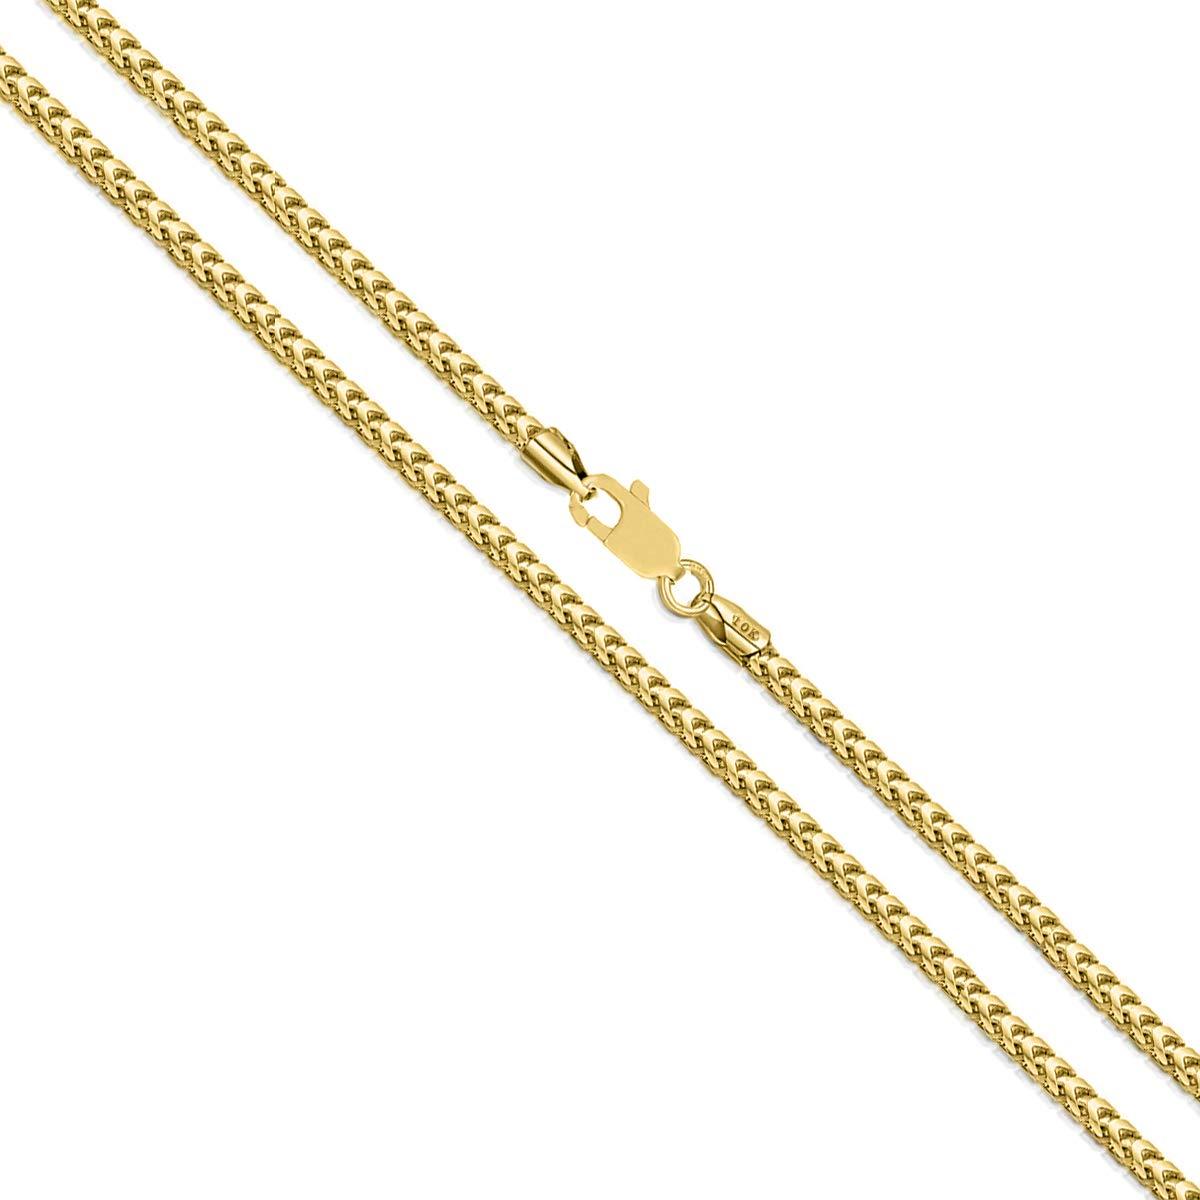 Orostar 10K Yellow Gold 1.4MM Diamond Cut Square Franco Chain Necklace, 16'' - 30'' (20)